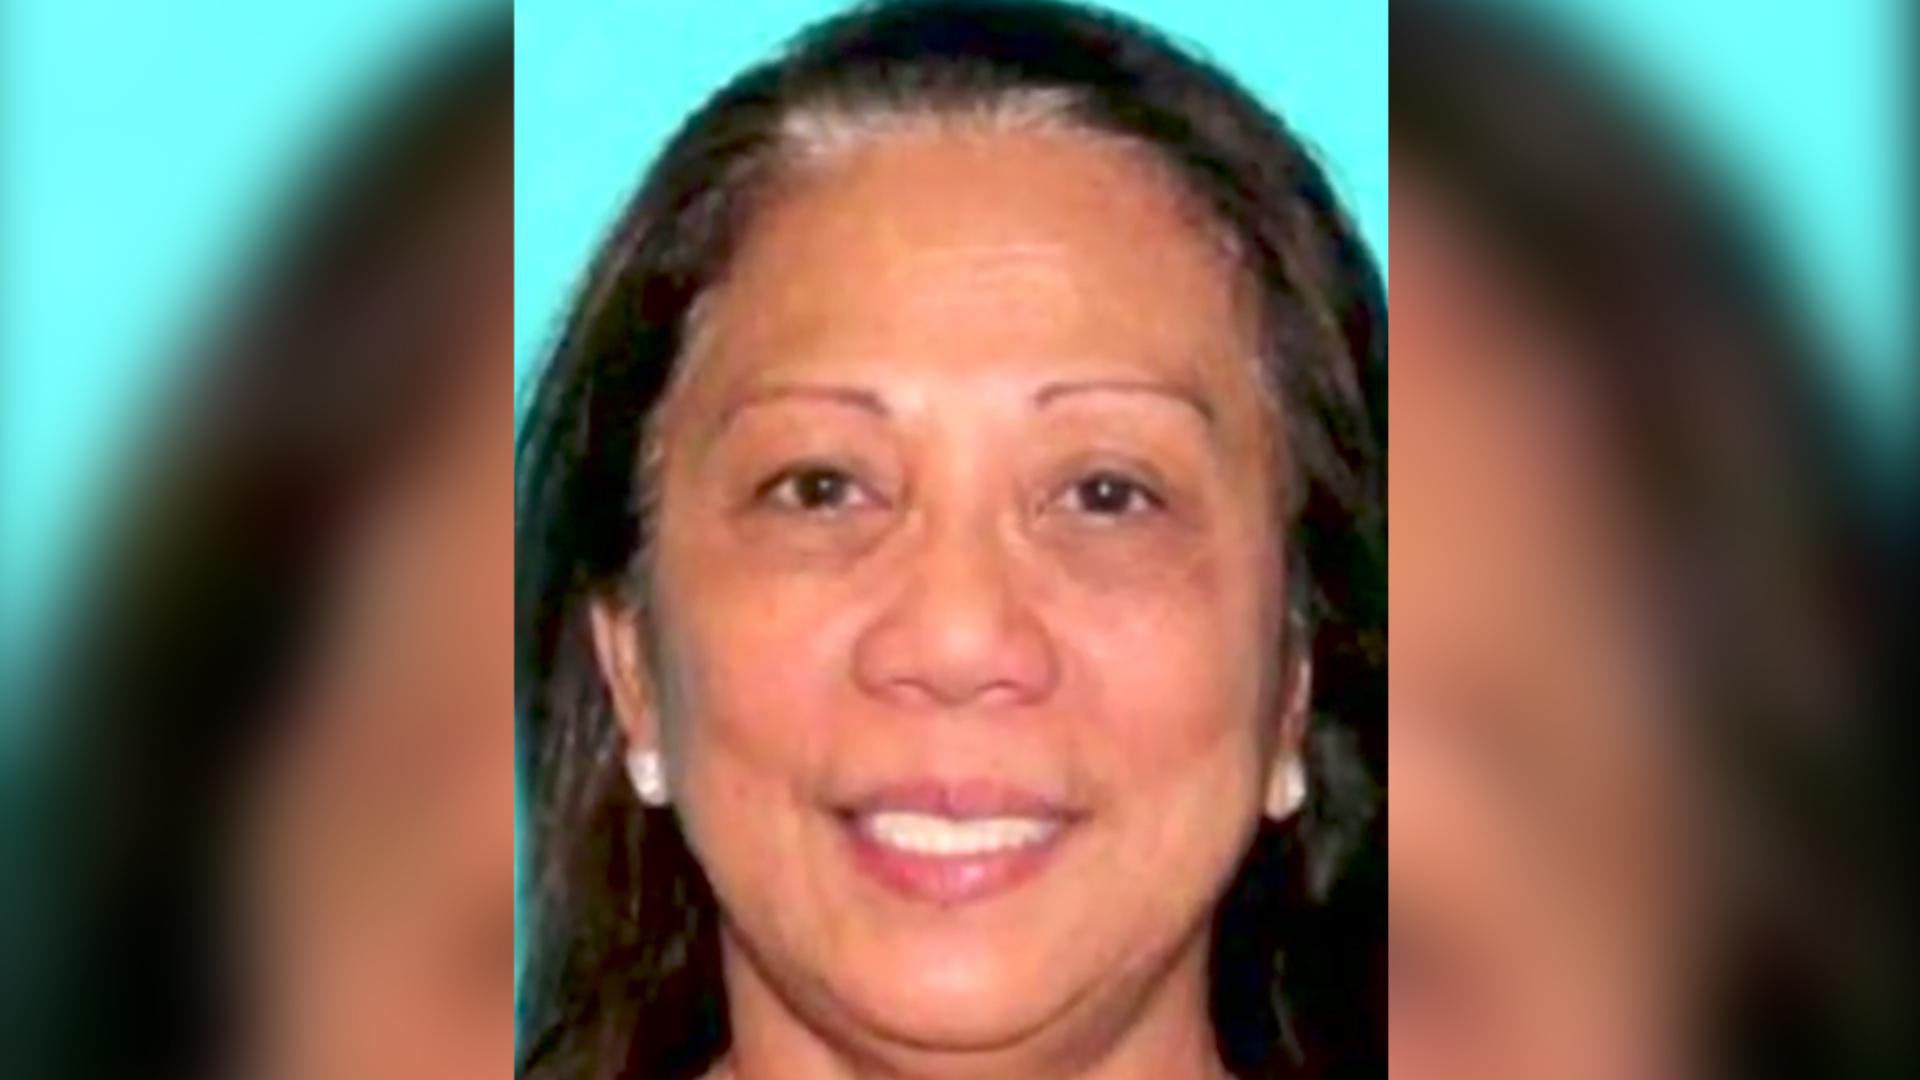 Girlfriend of Las Vegas gunman says she had no idea he was planning attack